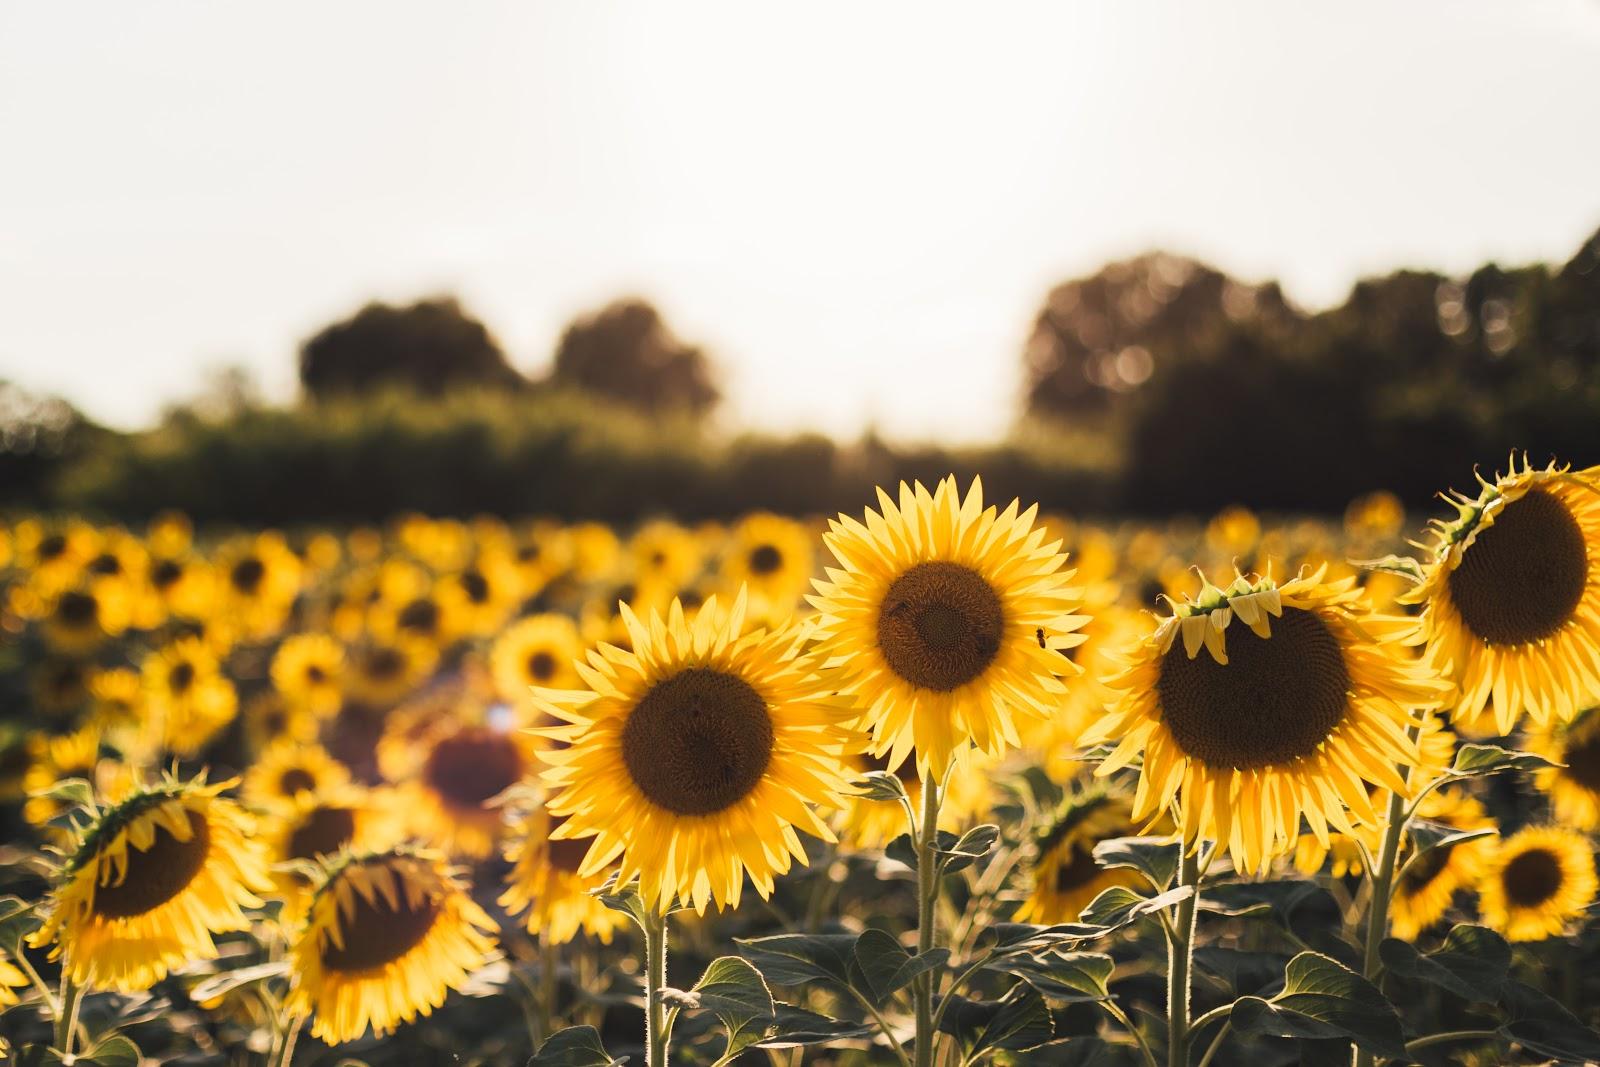 Sunflower Plants in Bloom